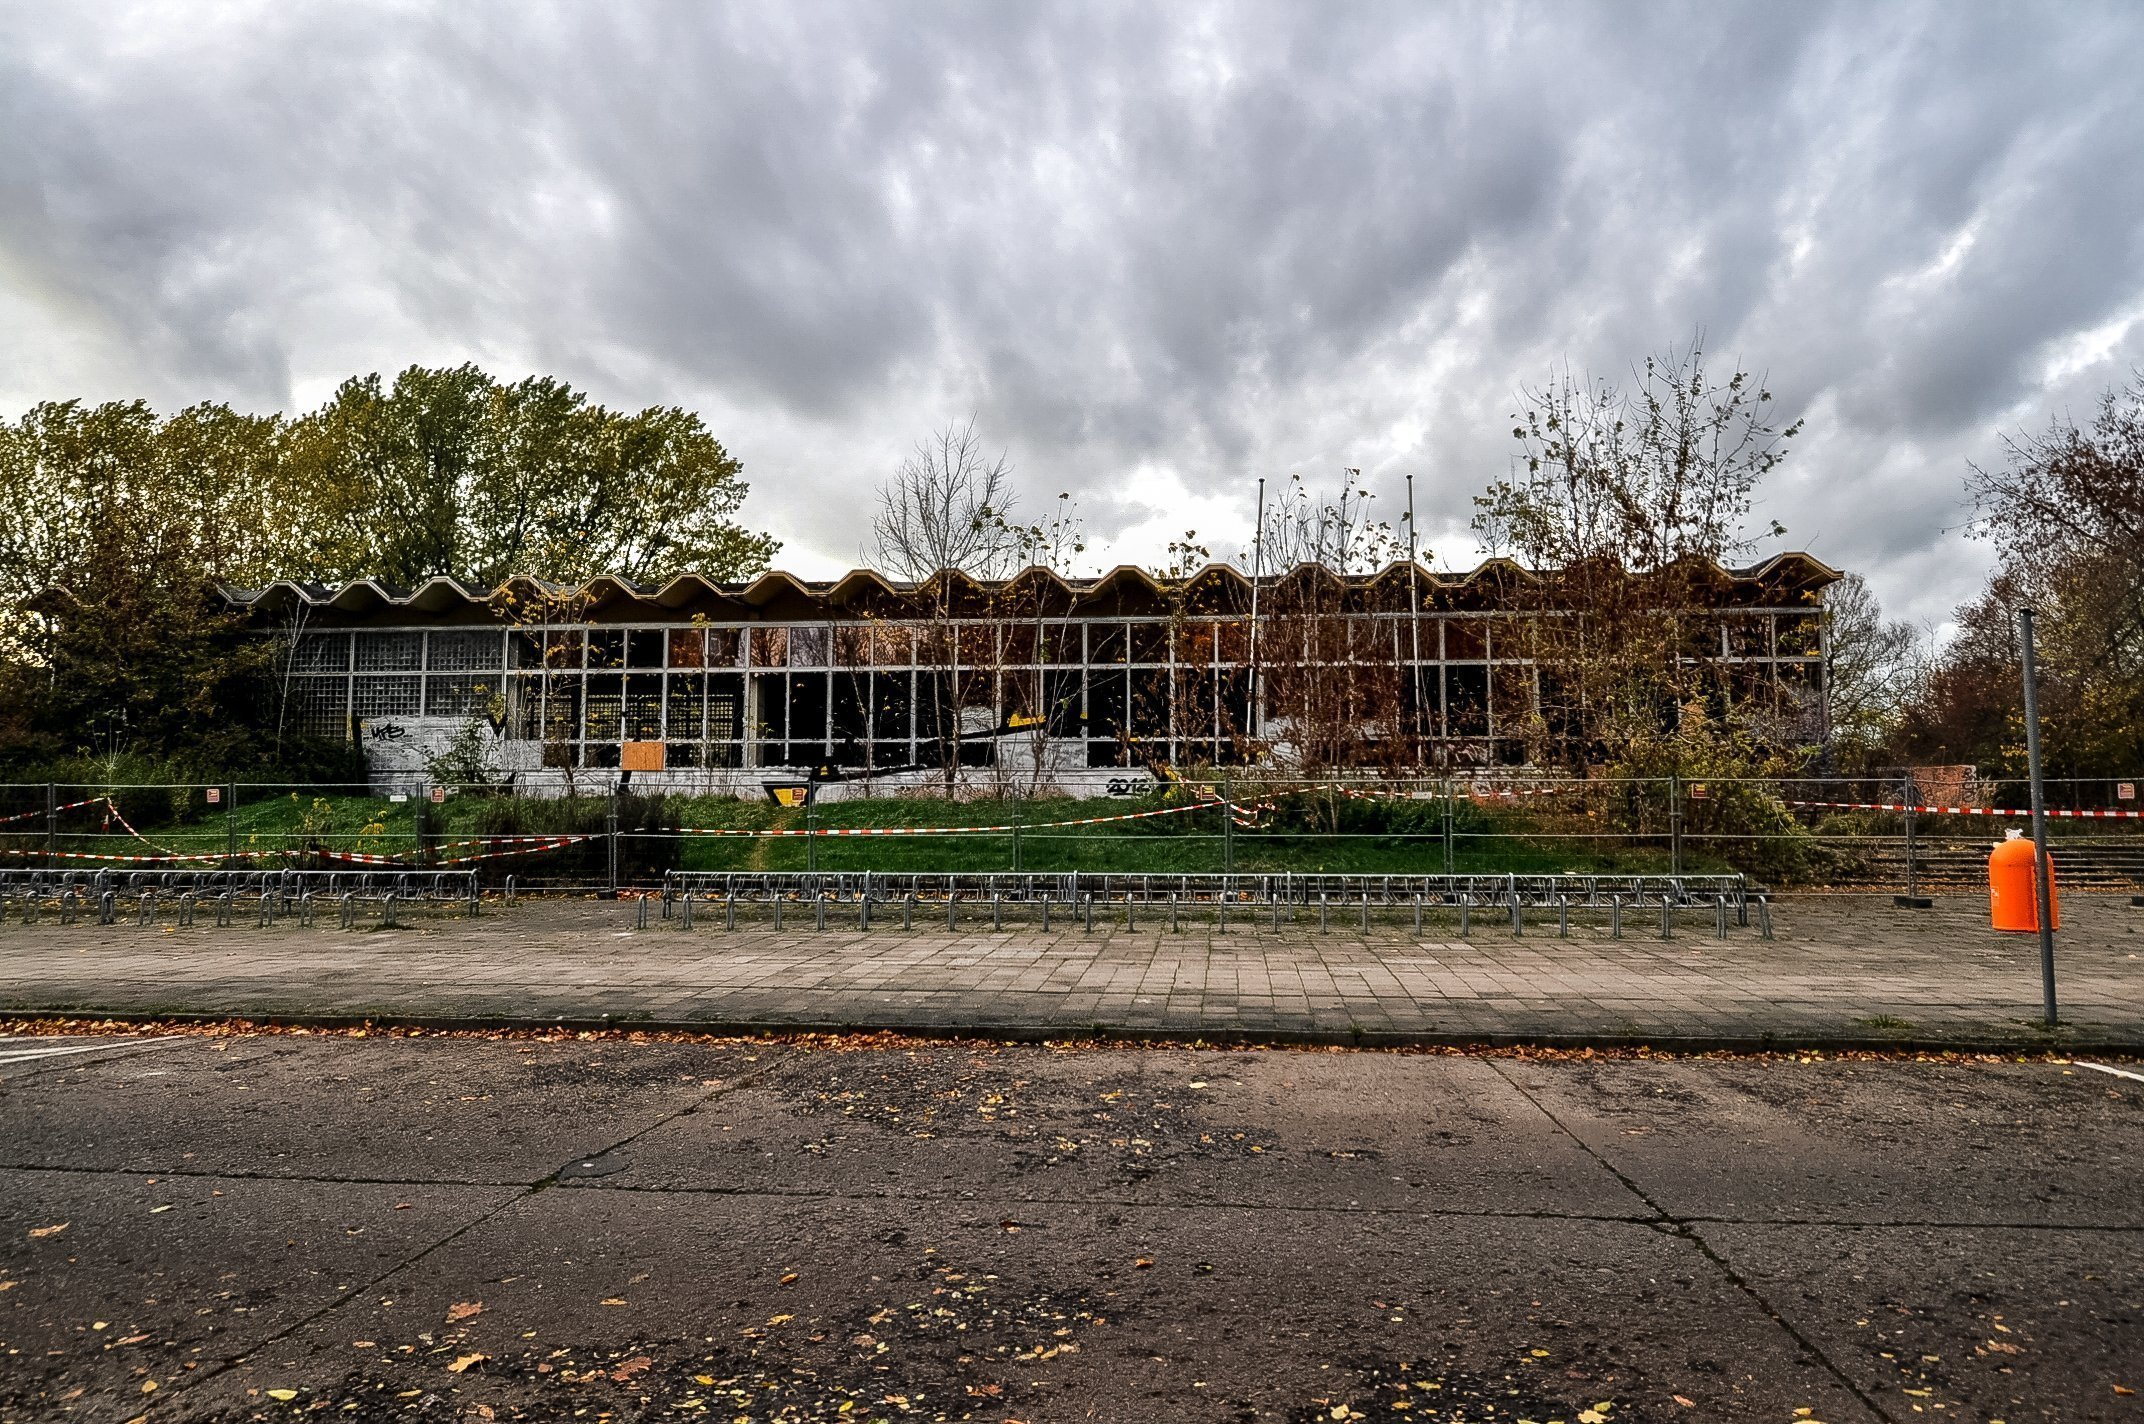 schwimhalle pankow verlassenes schwimbad pankow abandoned pool berlin urbex lost places abandoned berlin